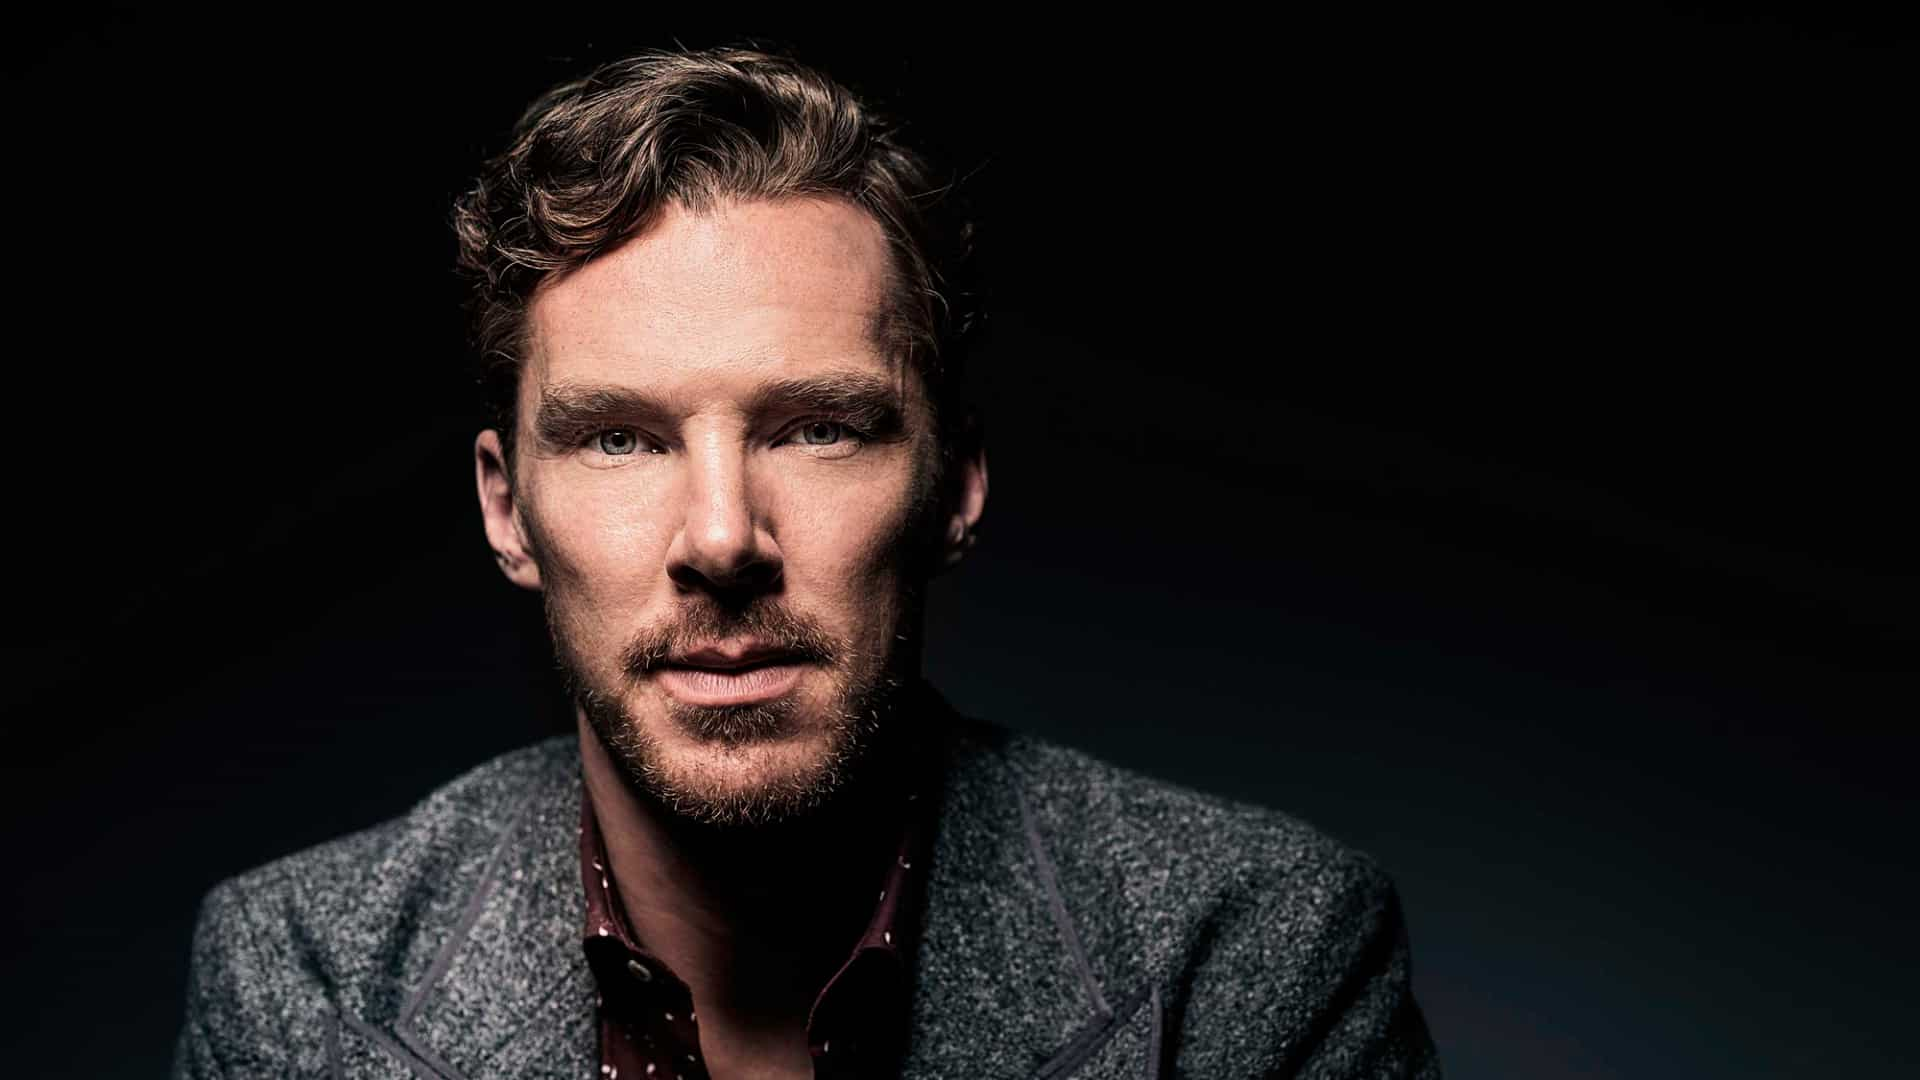 50 zaujímavostí o Benedictovi Cumberbatchovi